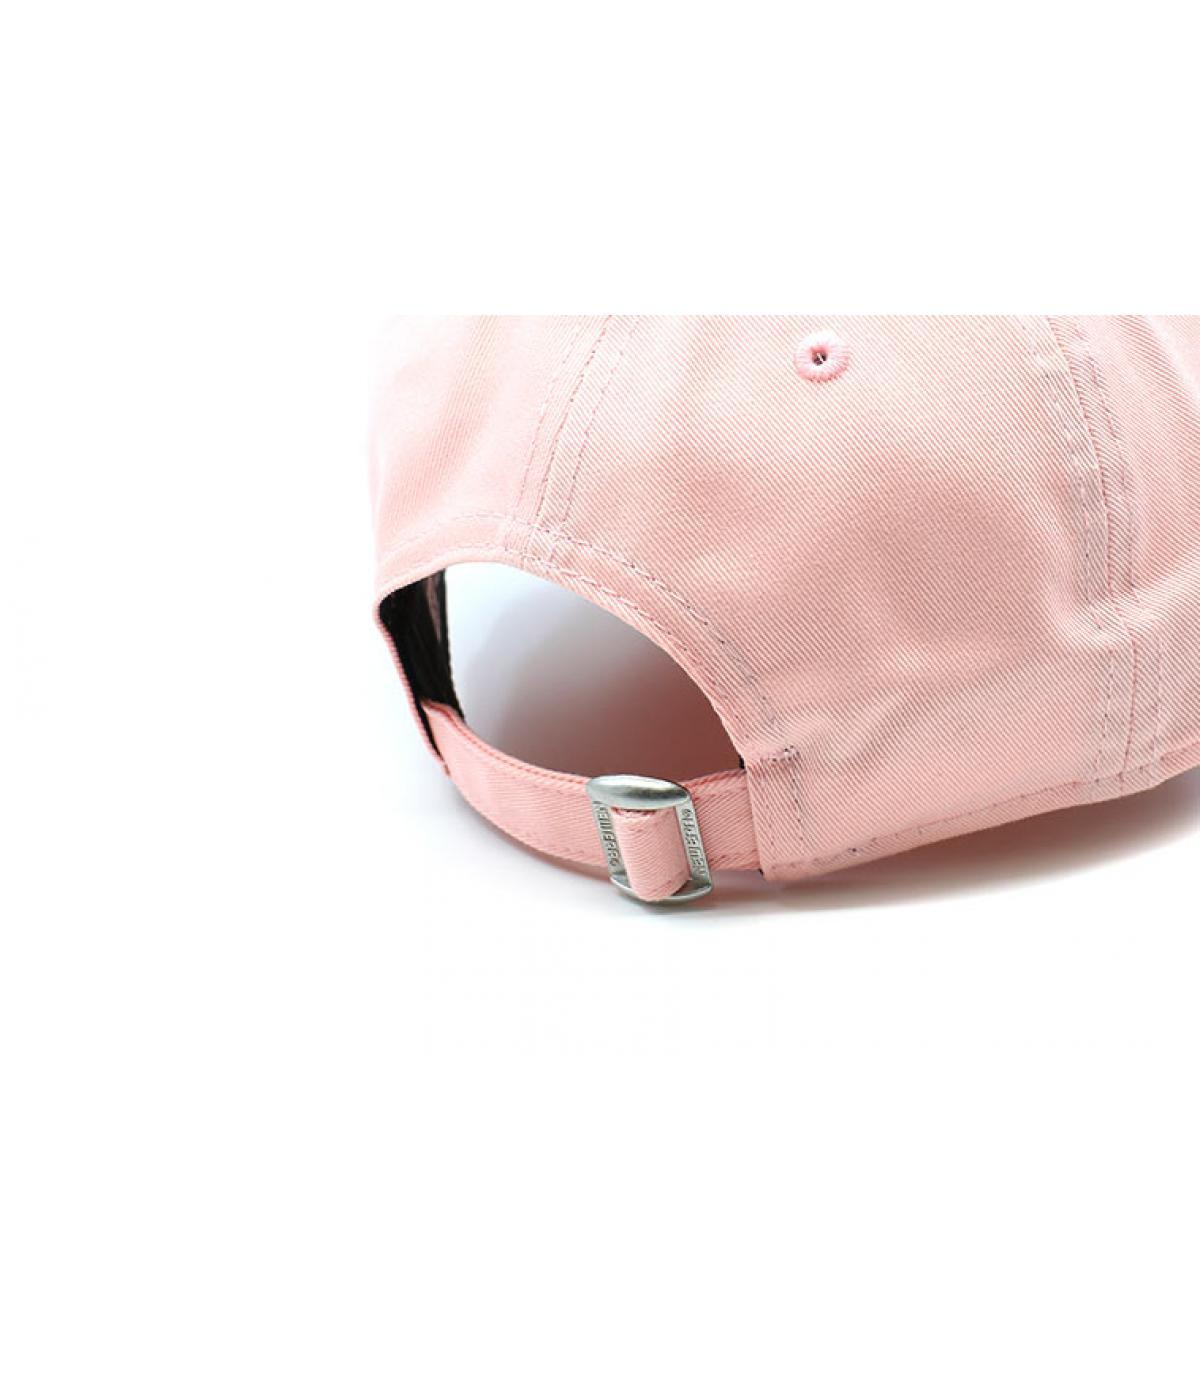 Dettagli Casquette Wmns Heart LA 940 pink - image 5